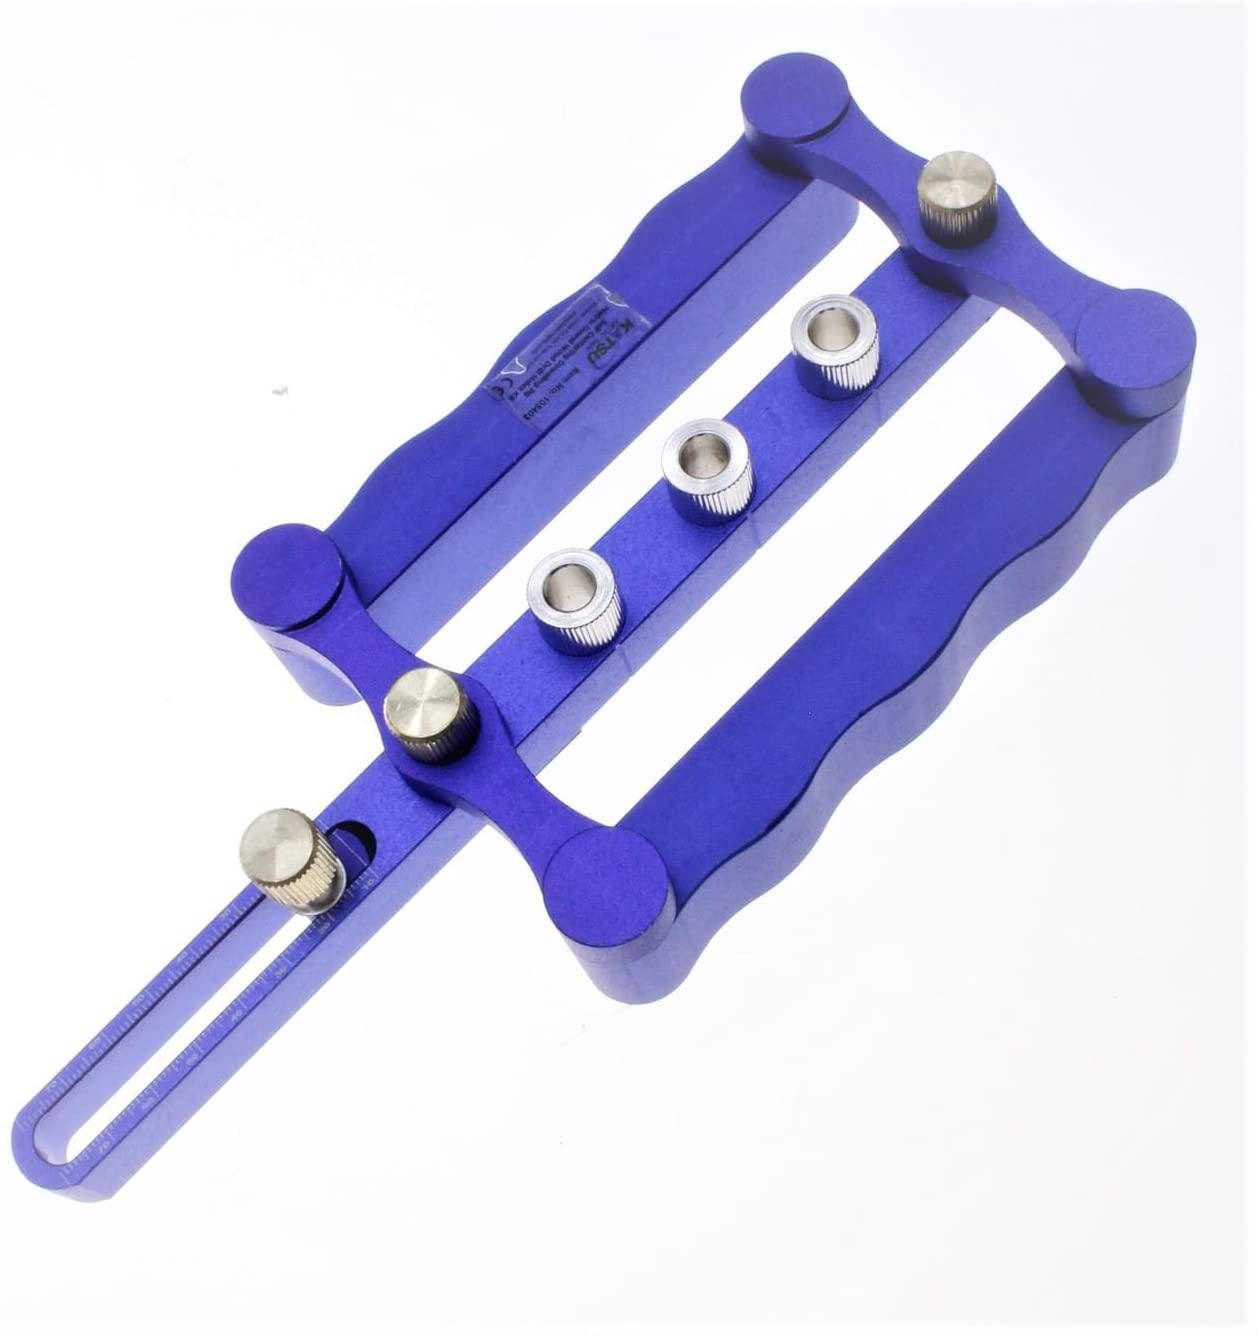 105403 Katsu Tools Self Centering Dowelling Jig Metric Dowel Wood Drill Holes Kit